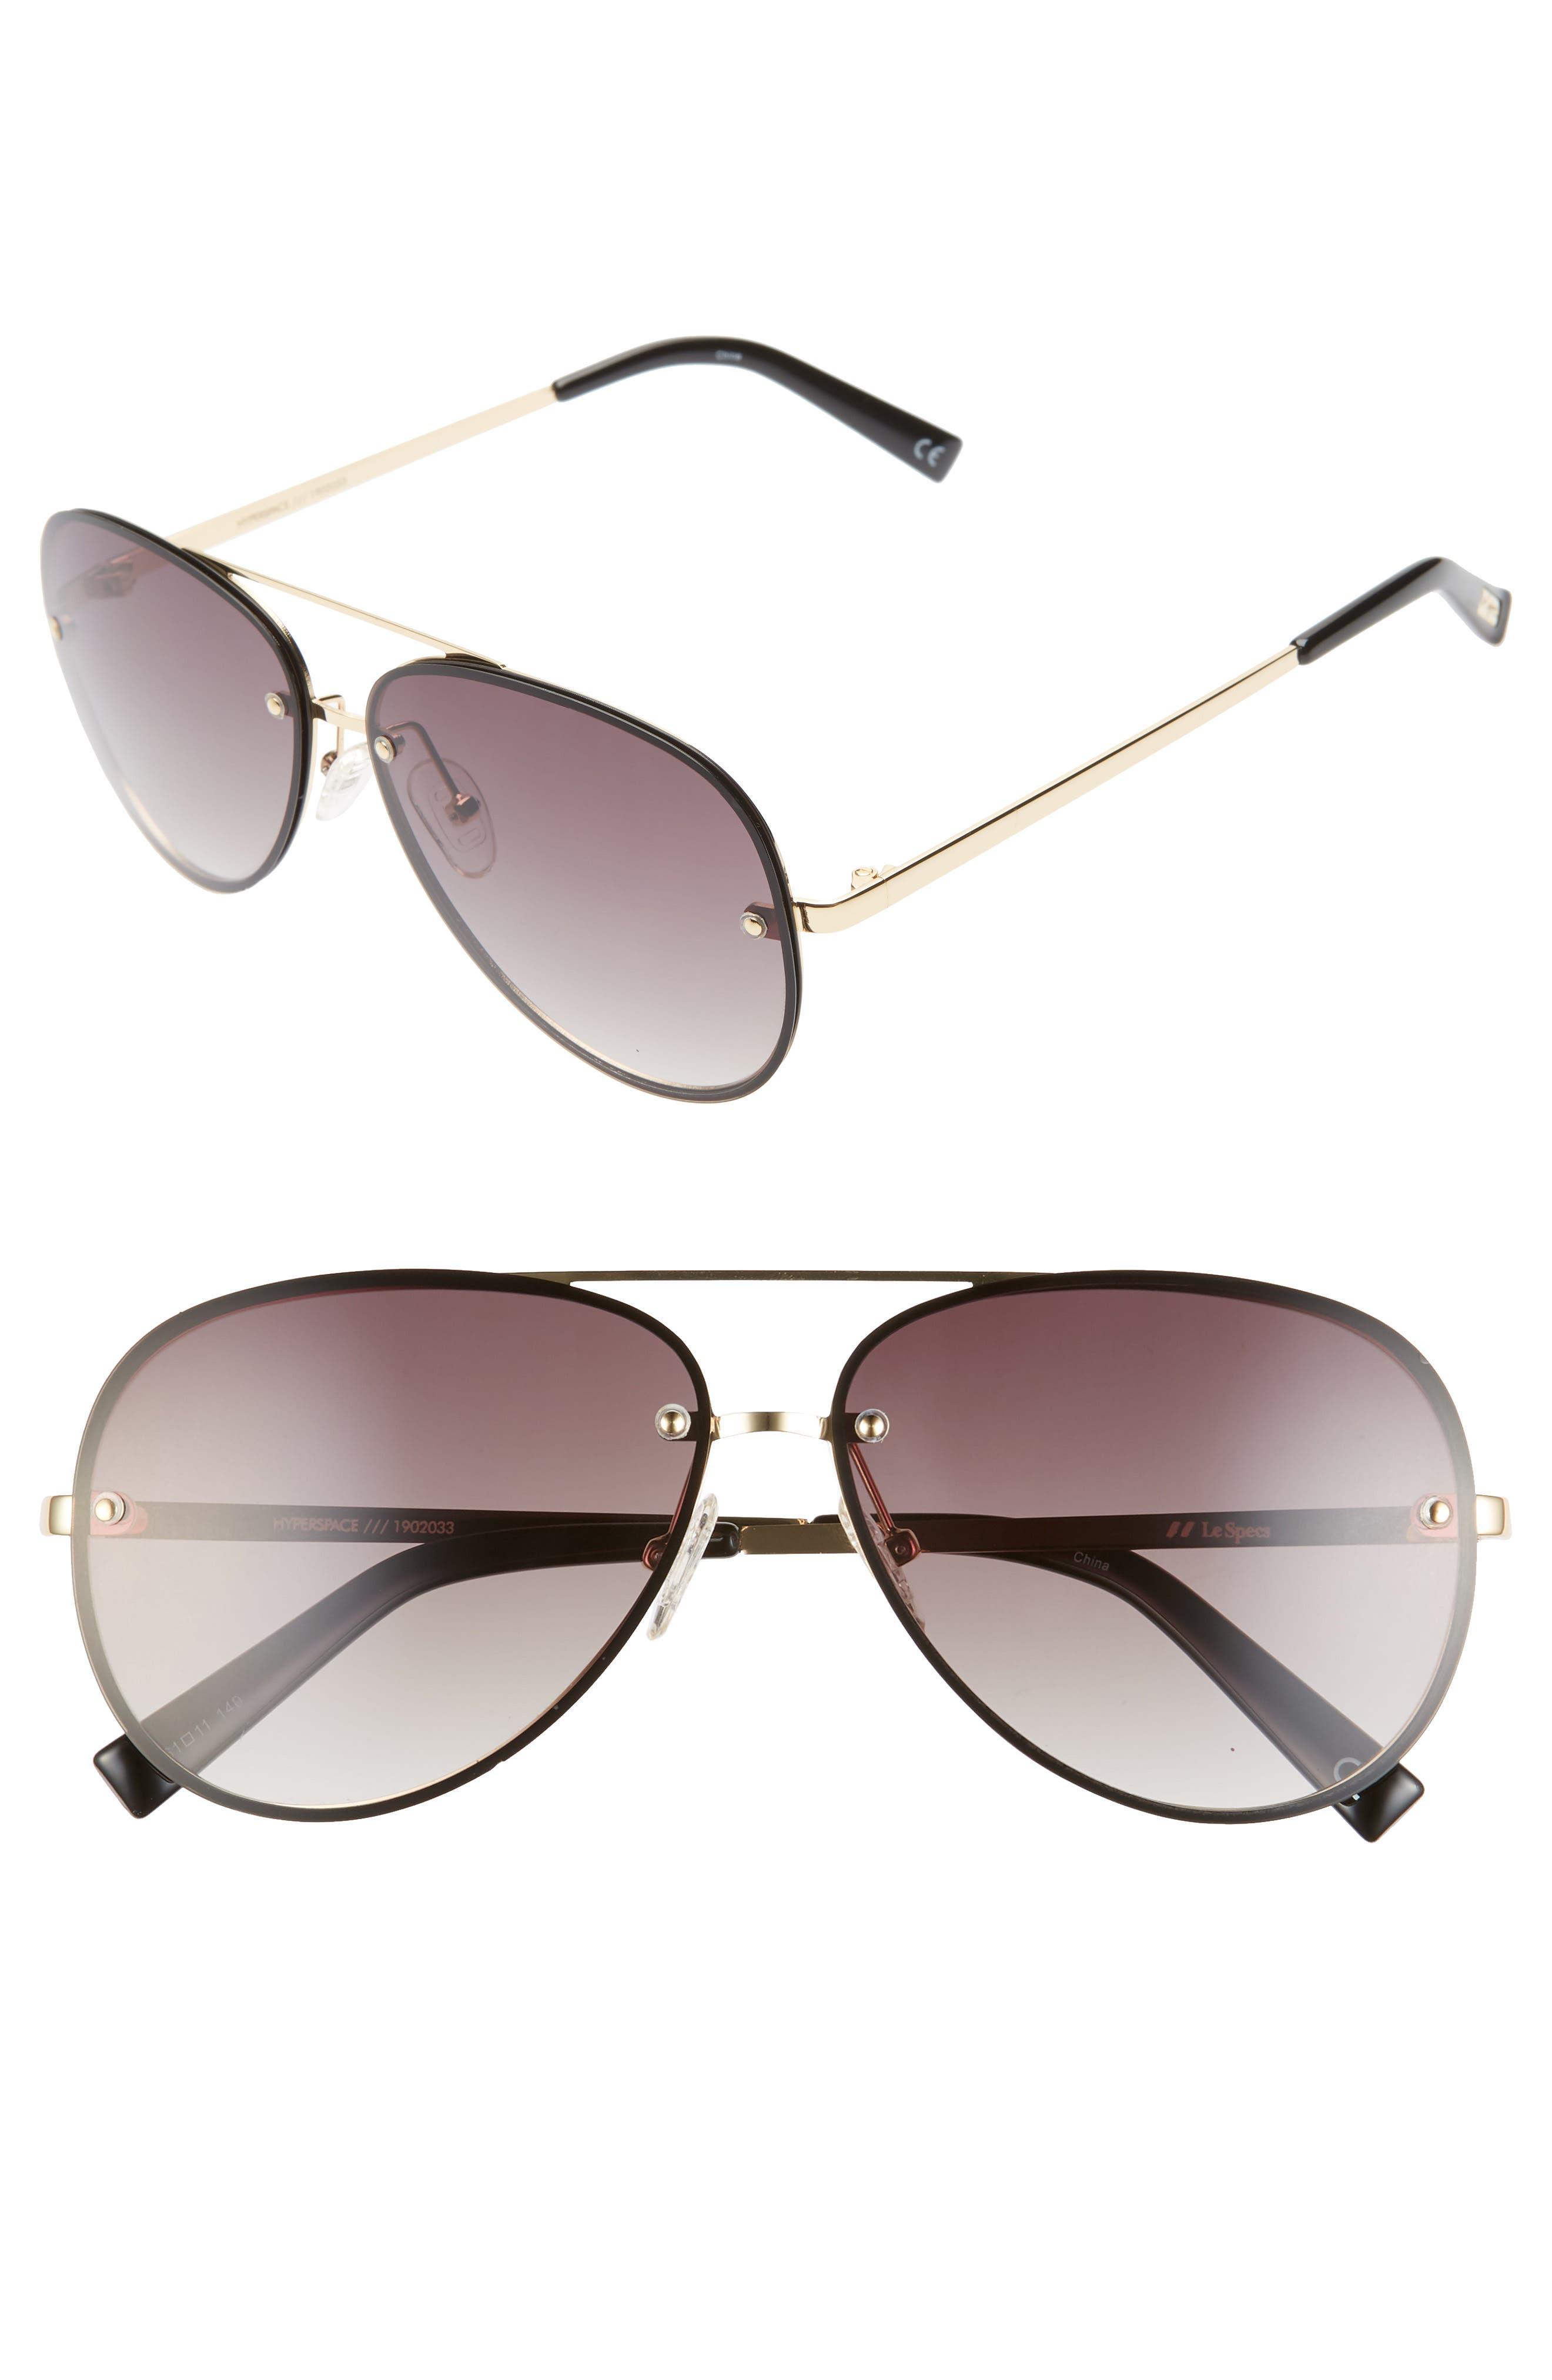 Le Specs Hyperspace 61Mm Aviator Sunglasses - Black/ Gold/ Black